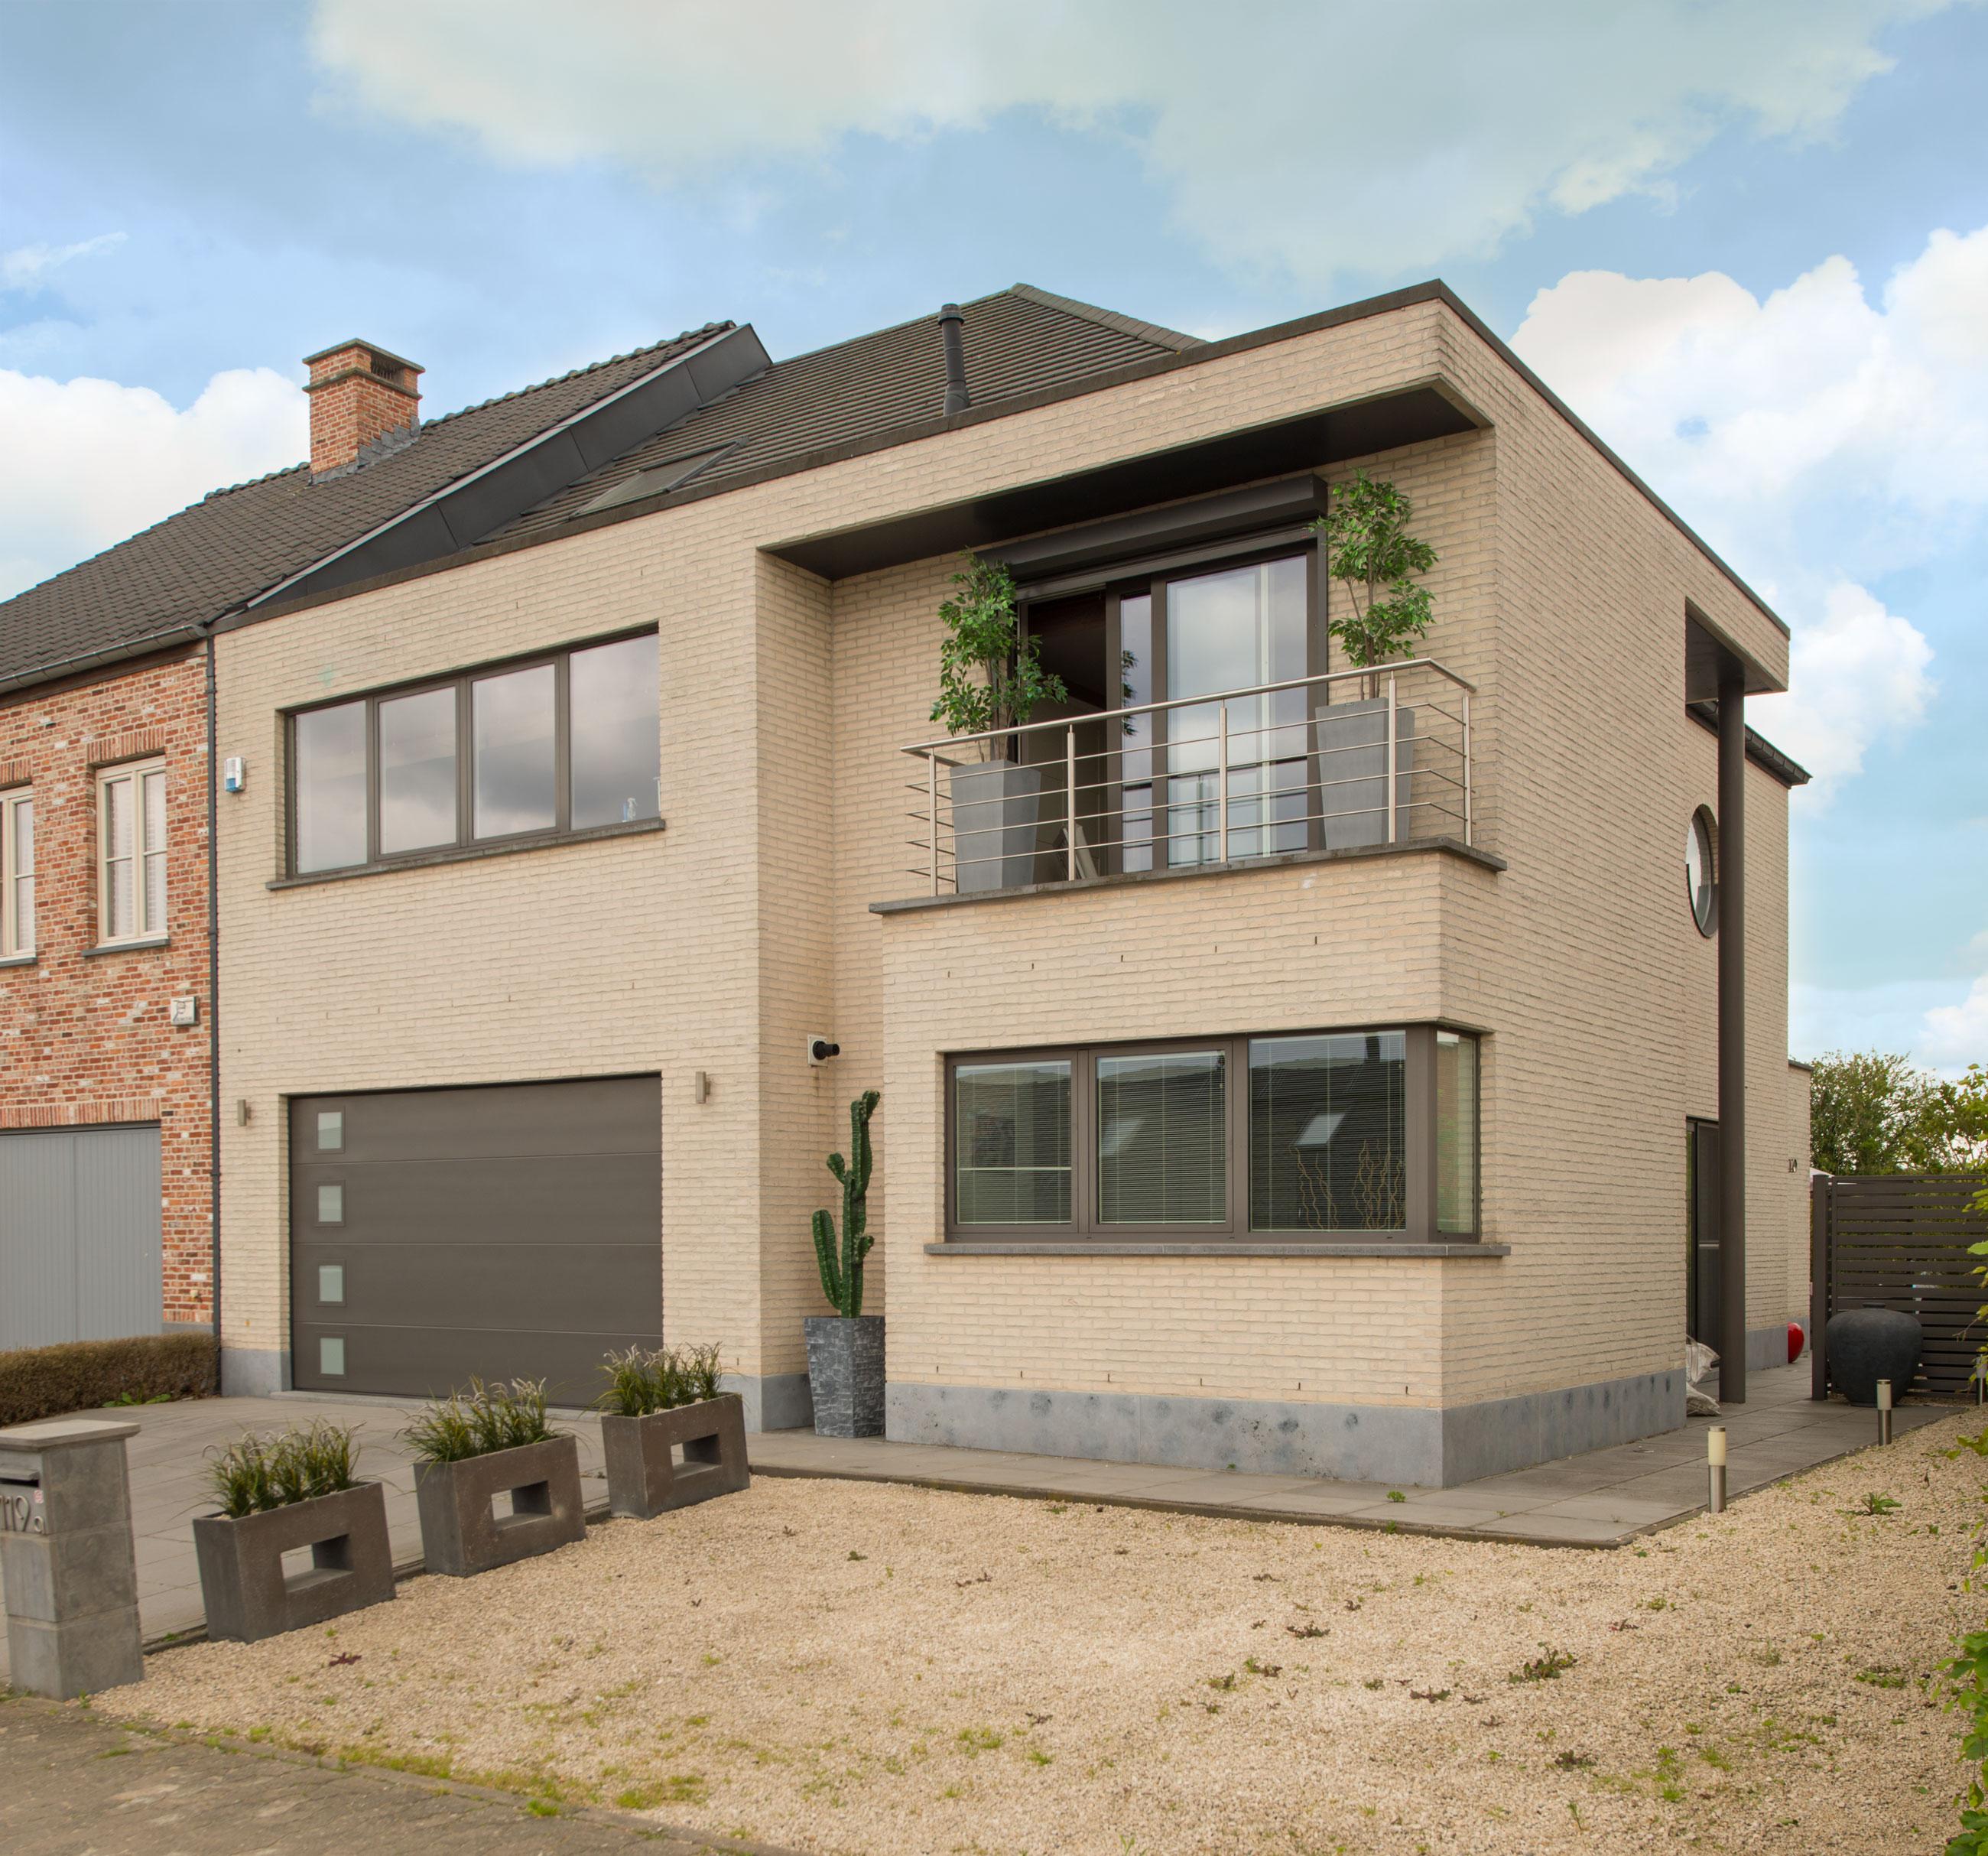 Heidestraat 119A, 1741 Wambeek